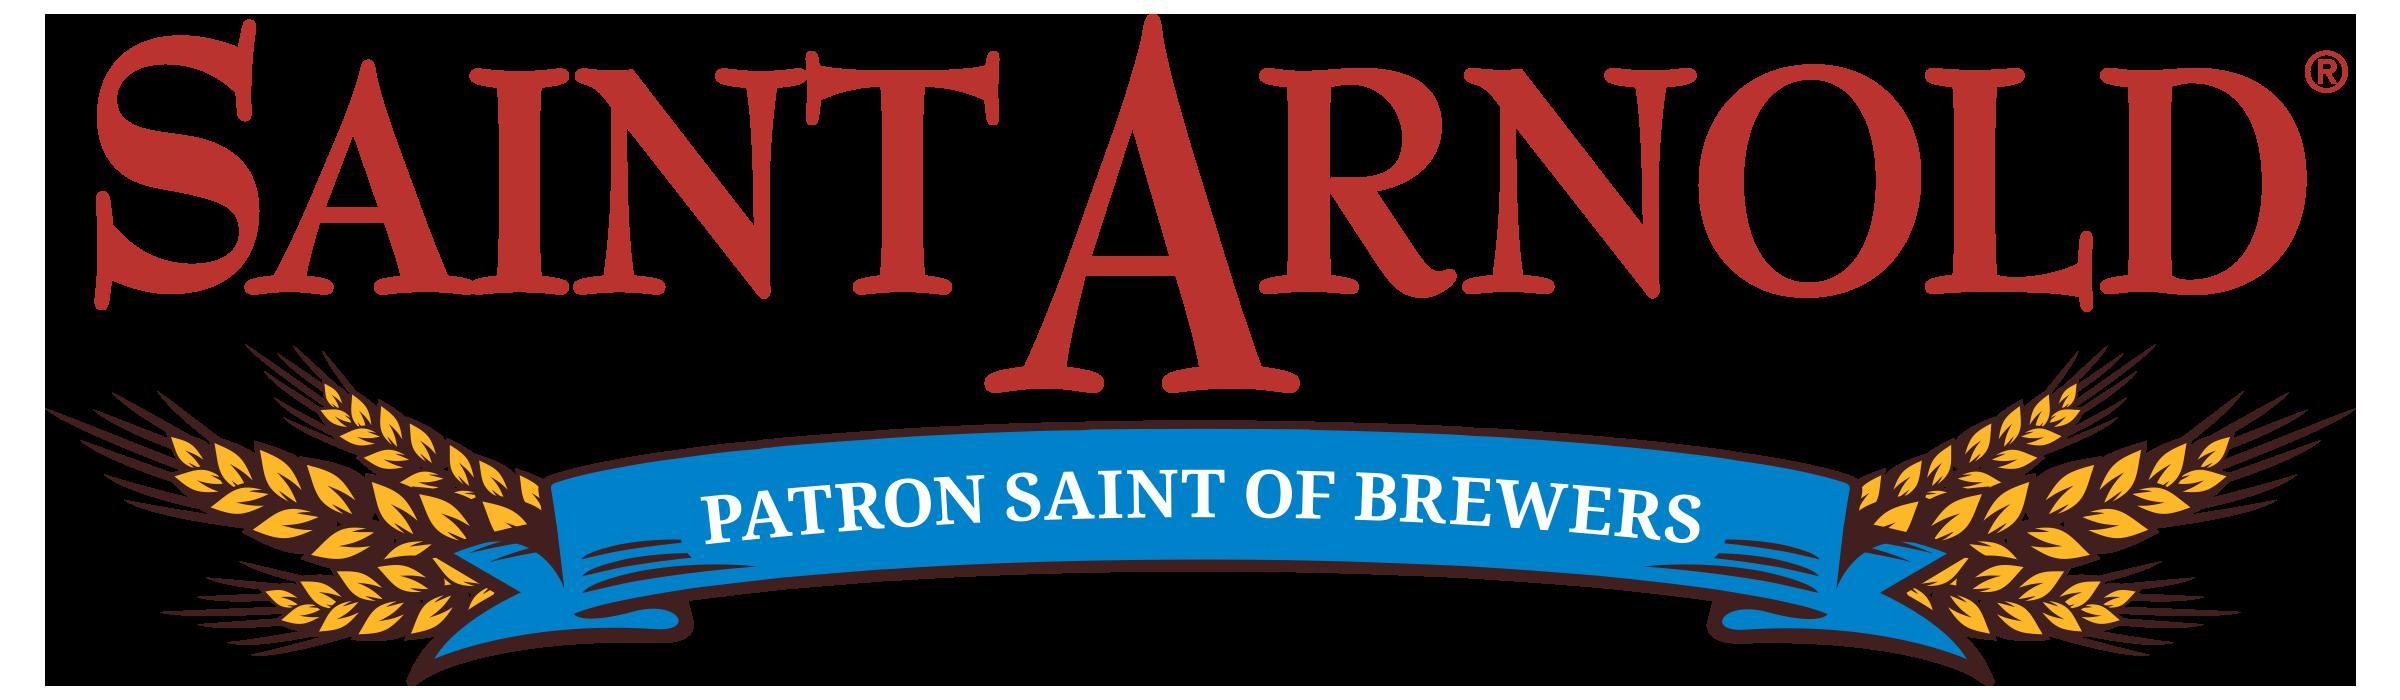 saint_arnold_banner_logo.png